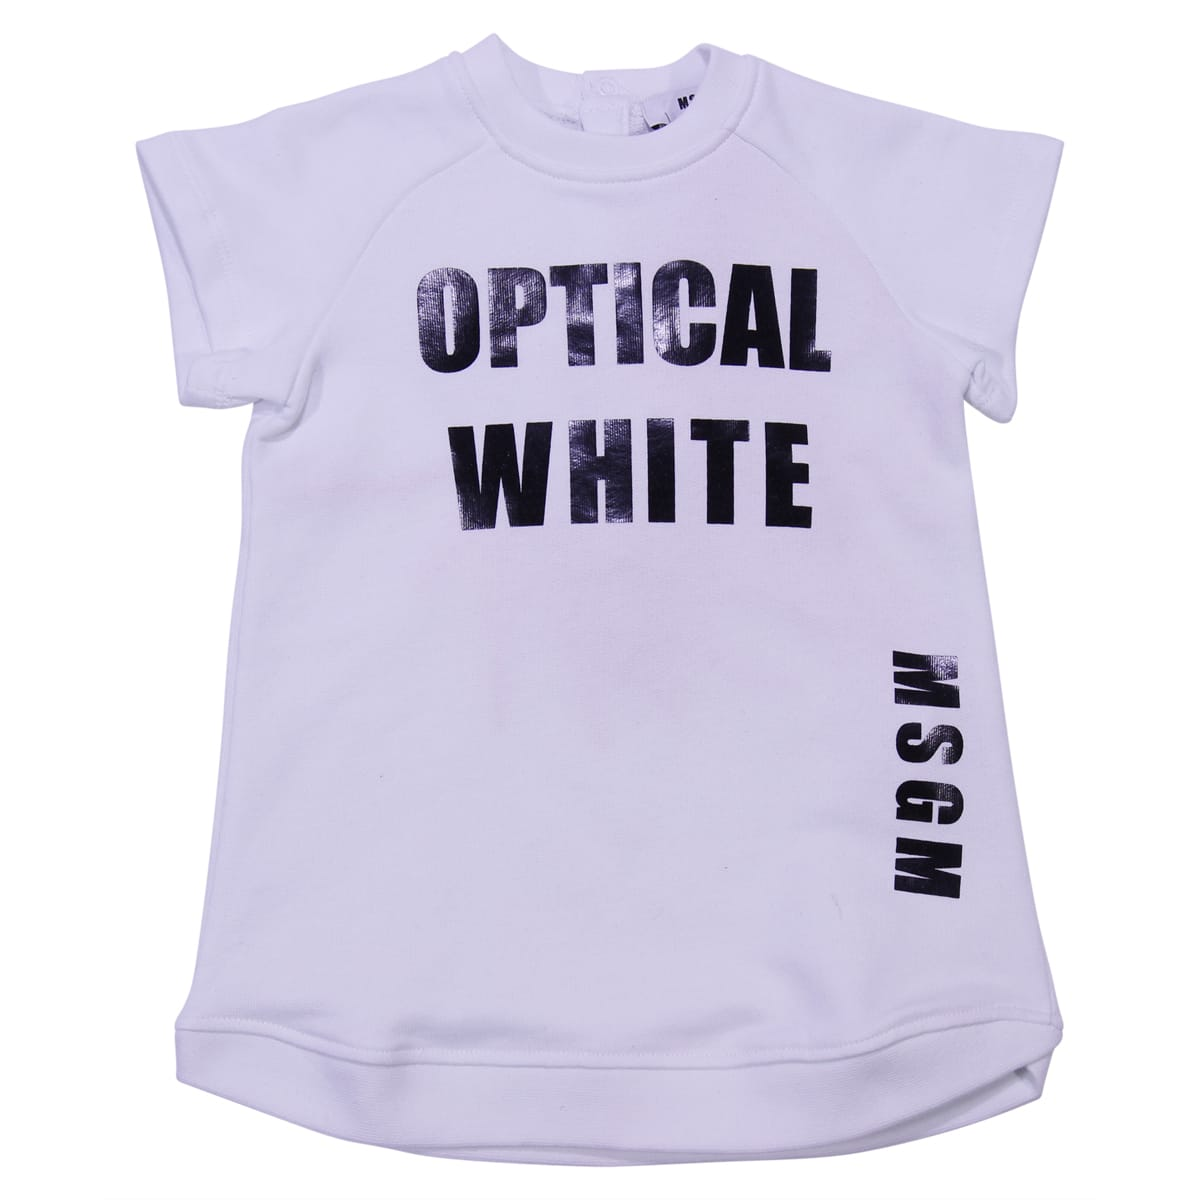 MSGM White Cotton Sweatshirt Dress